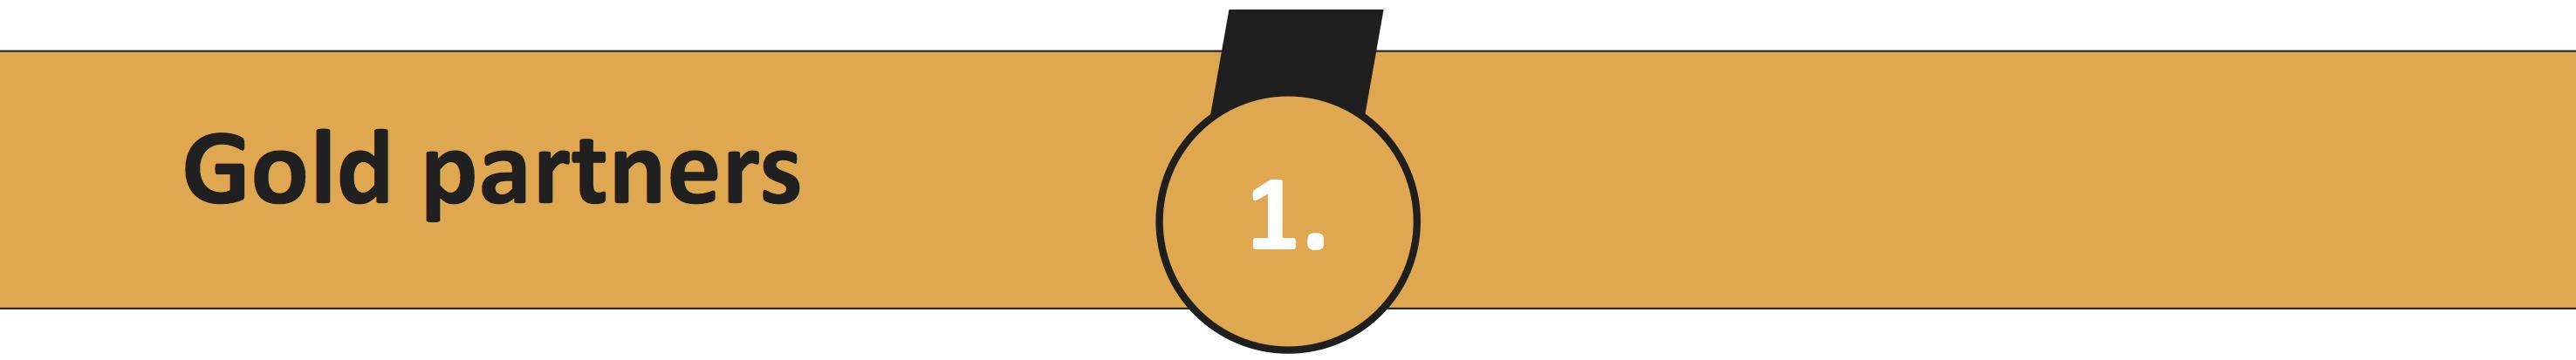 banner_gold